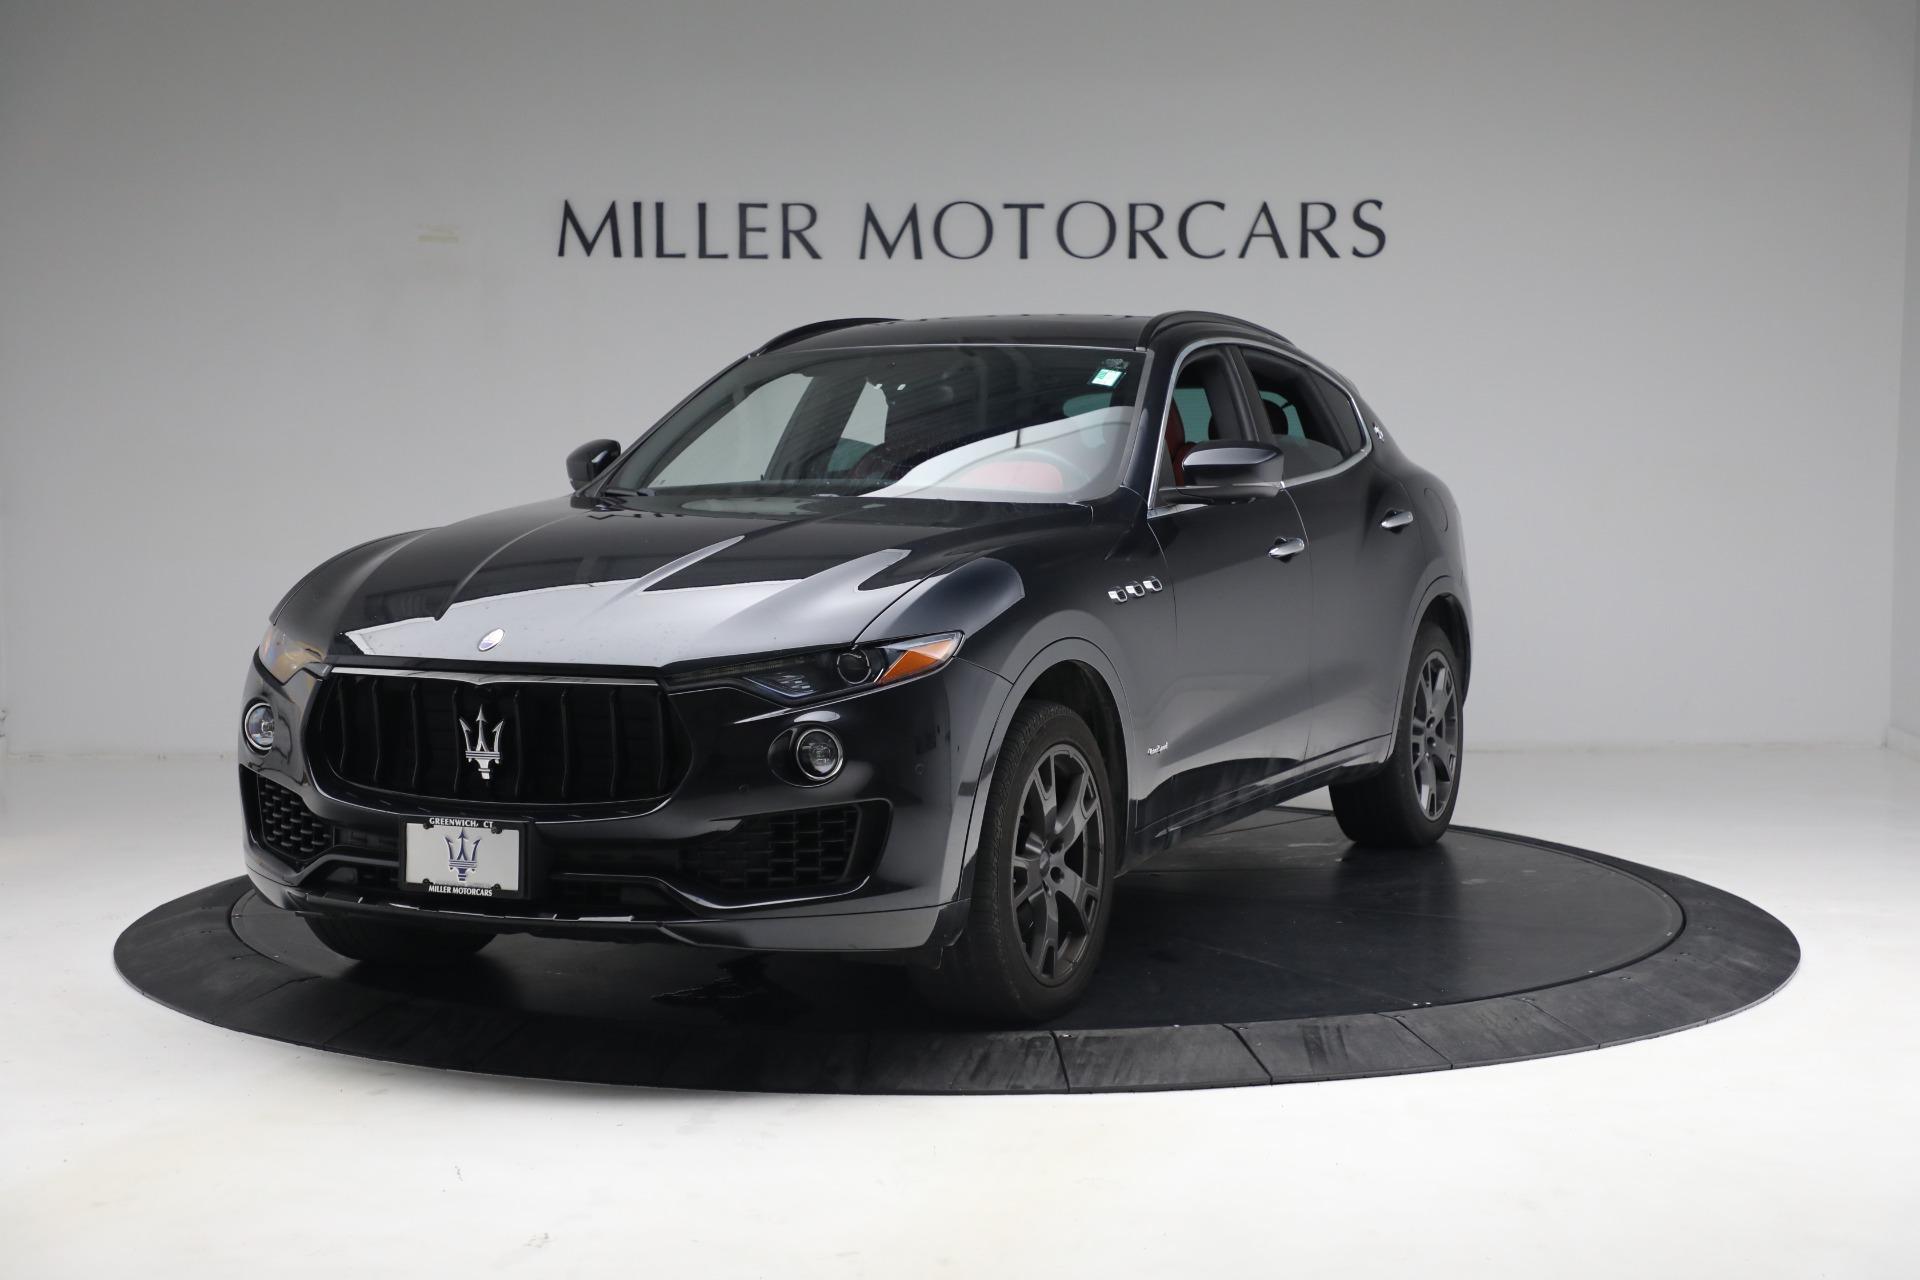 Used 2018 Maserati Levante GranSport for sale $59,900 at Alfa Romeo of Greenwich in Greenwich CT 06830 1